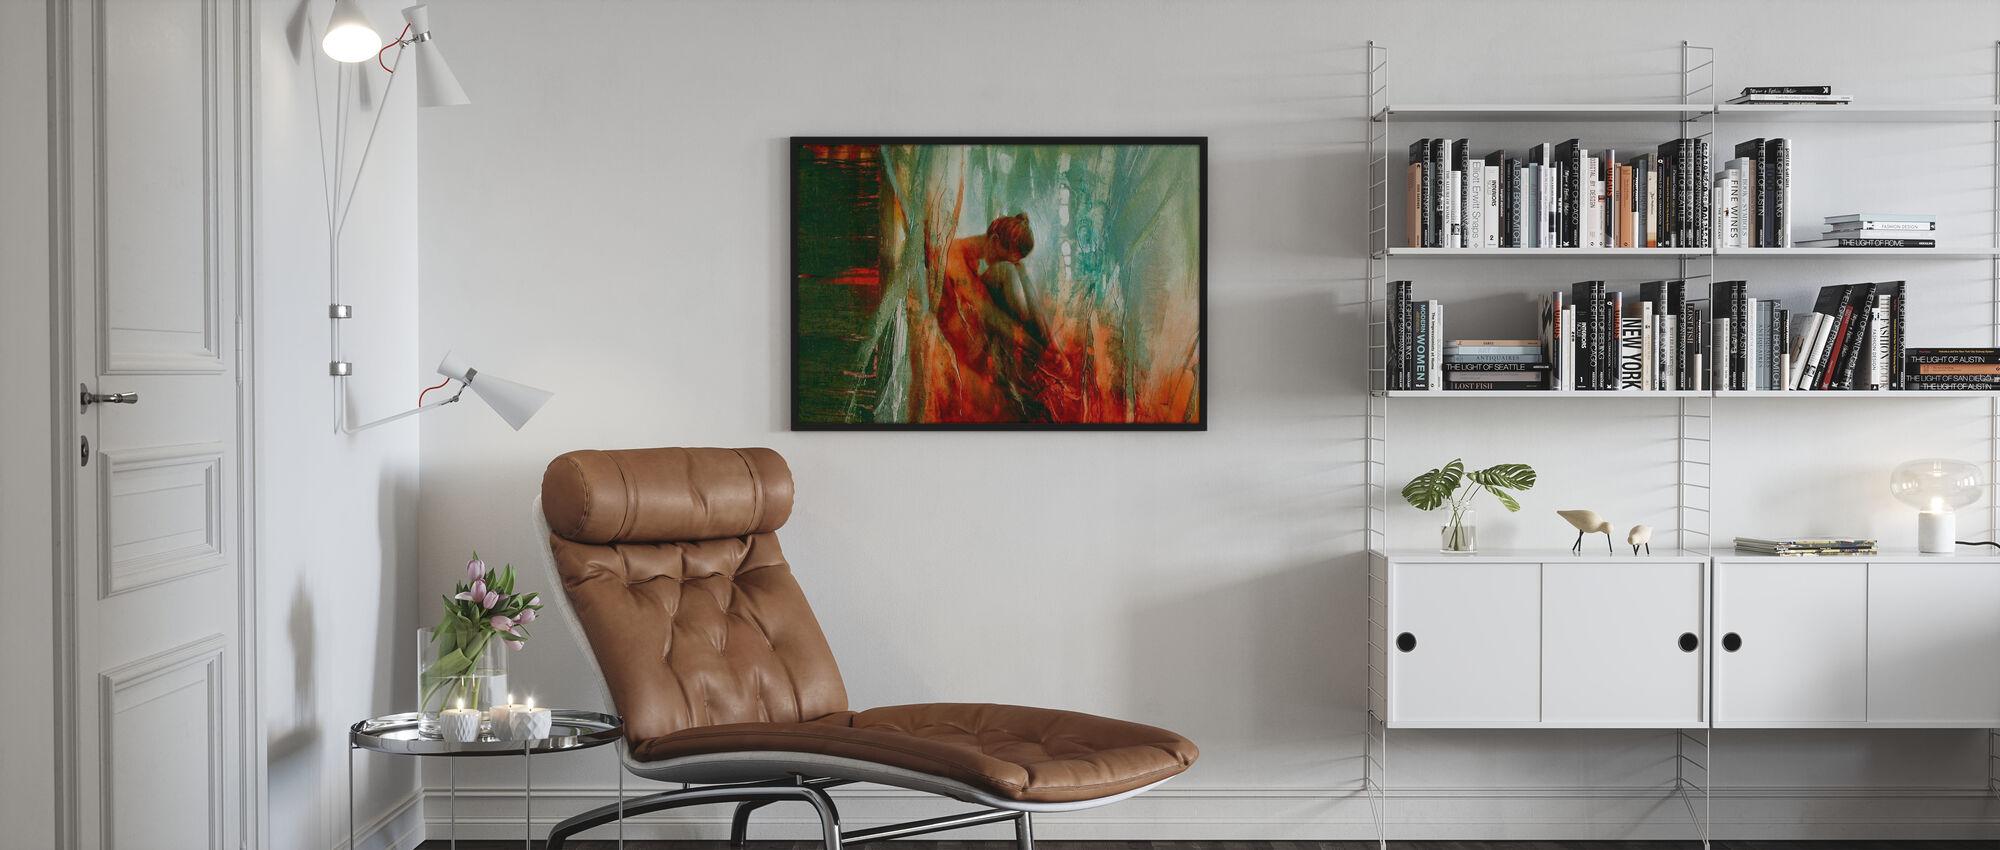 Vera - Poster - Living Room